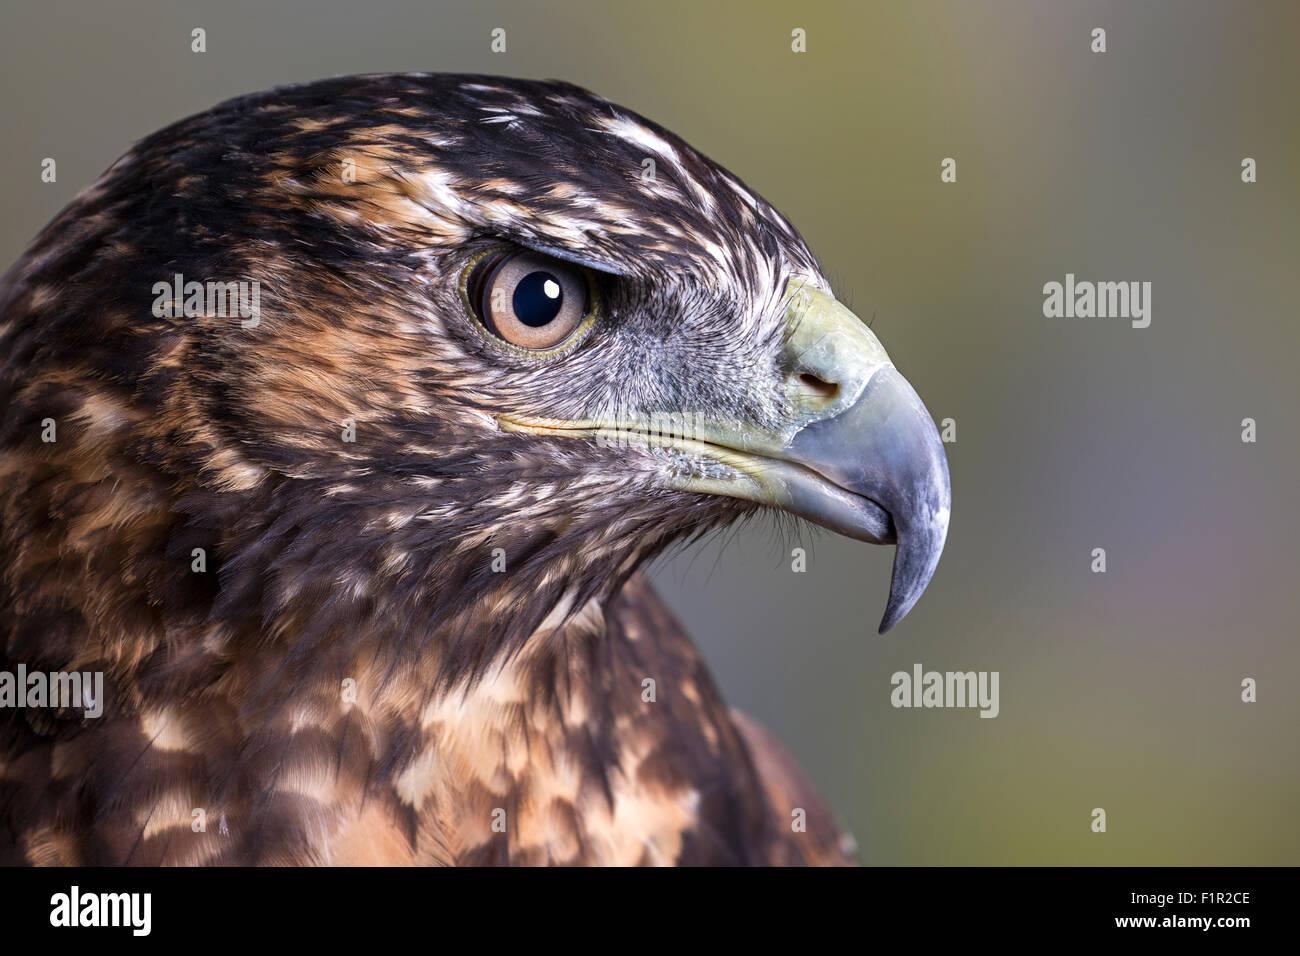 Juvenile female Chilean blue eagle or Black-chested buzzard-eagle - Stock Image